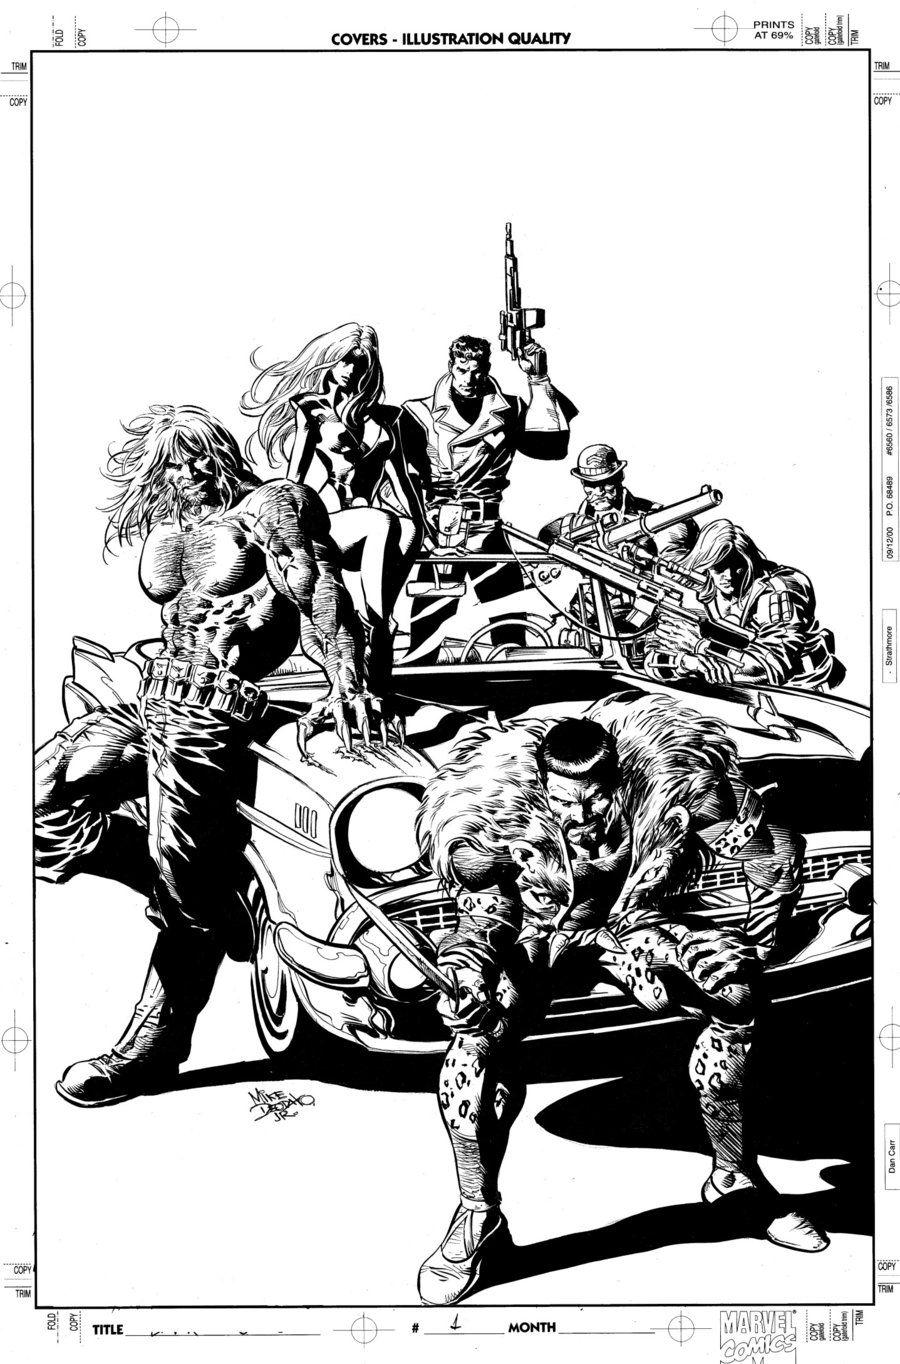 New Avengers 10 Cover Art by MikeDeodatoJr.deviantart.com on @deviantART